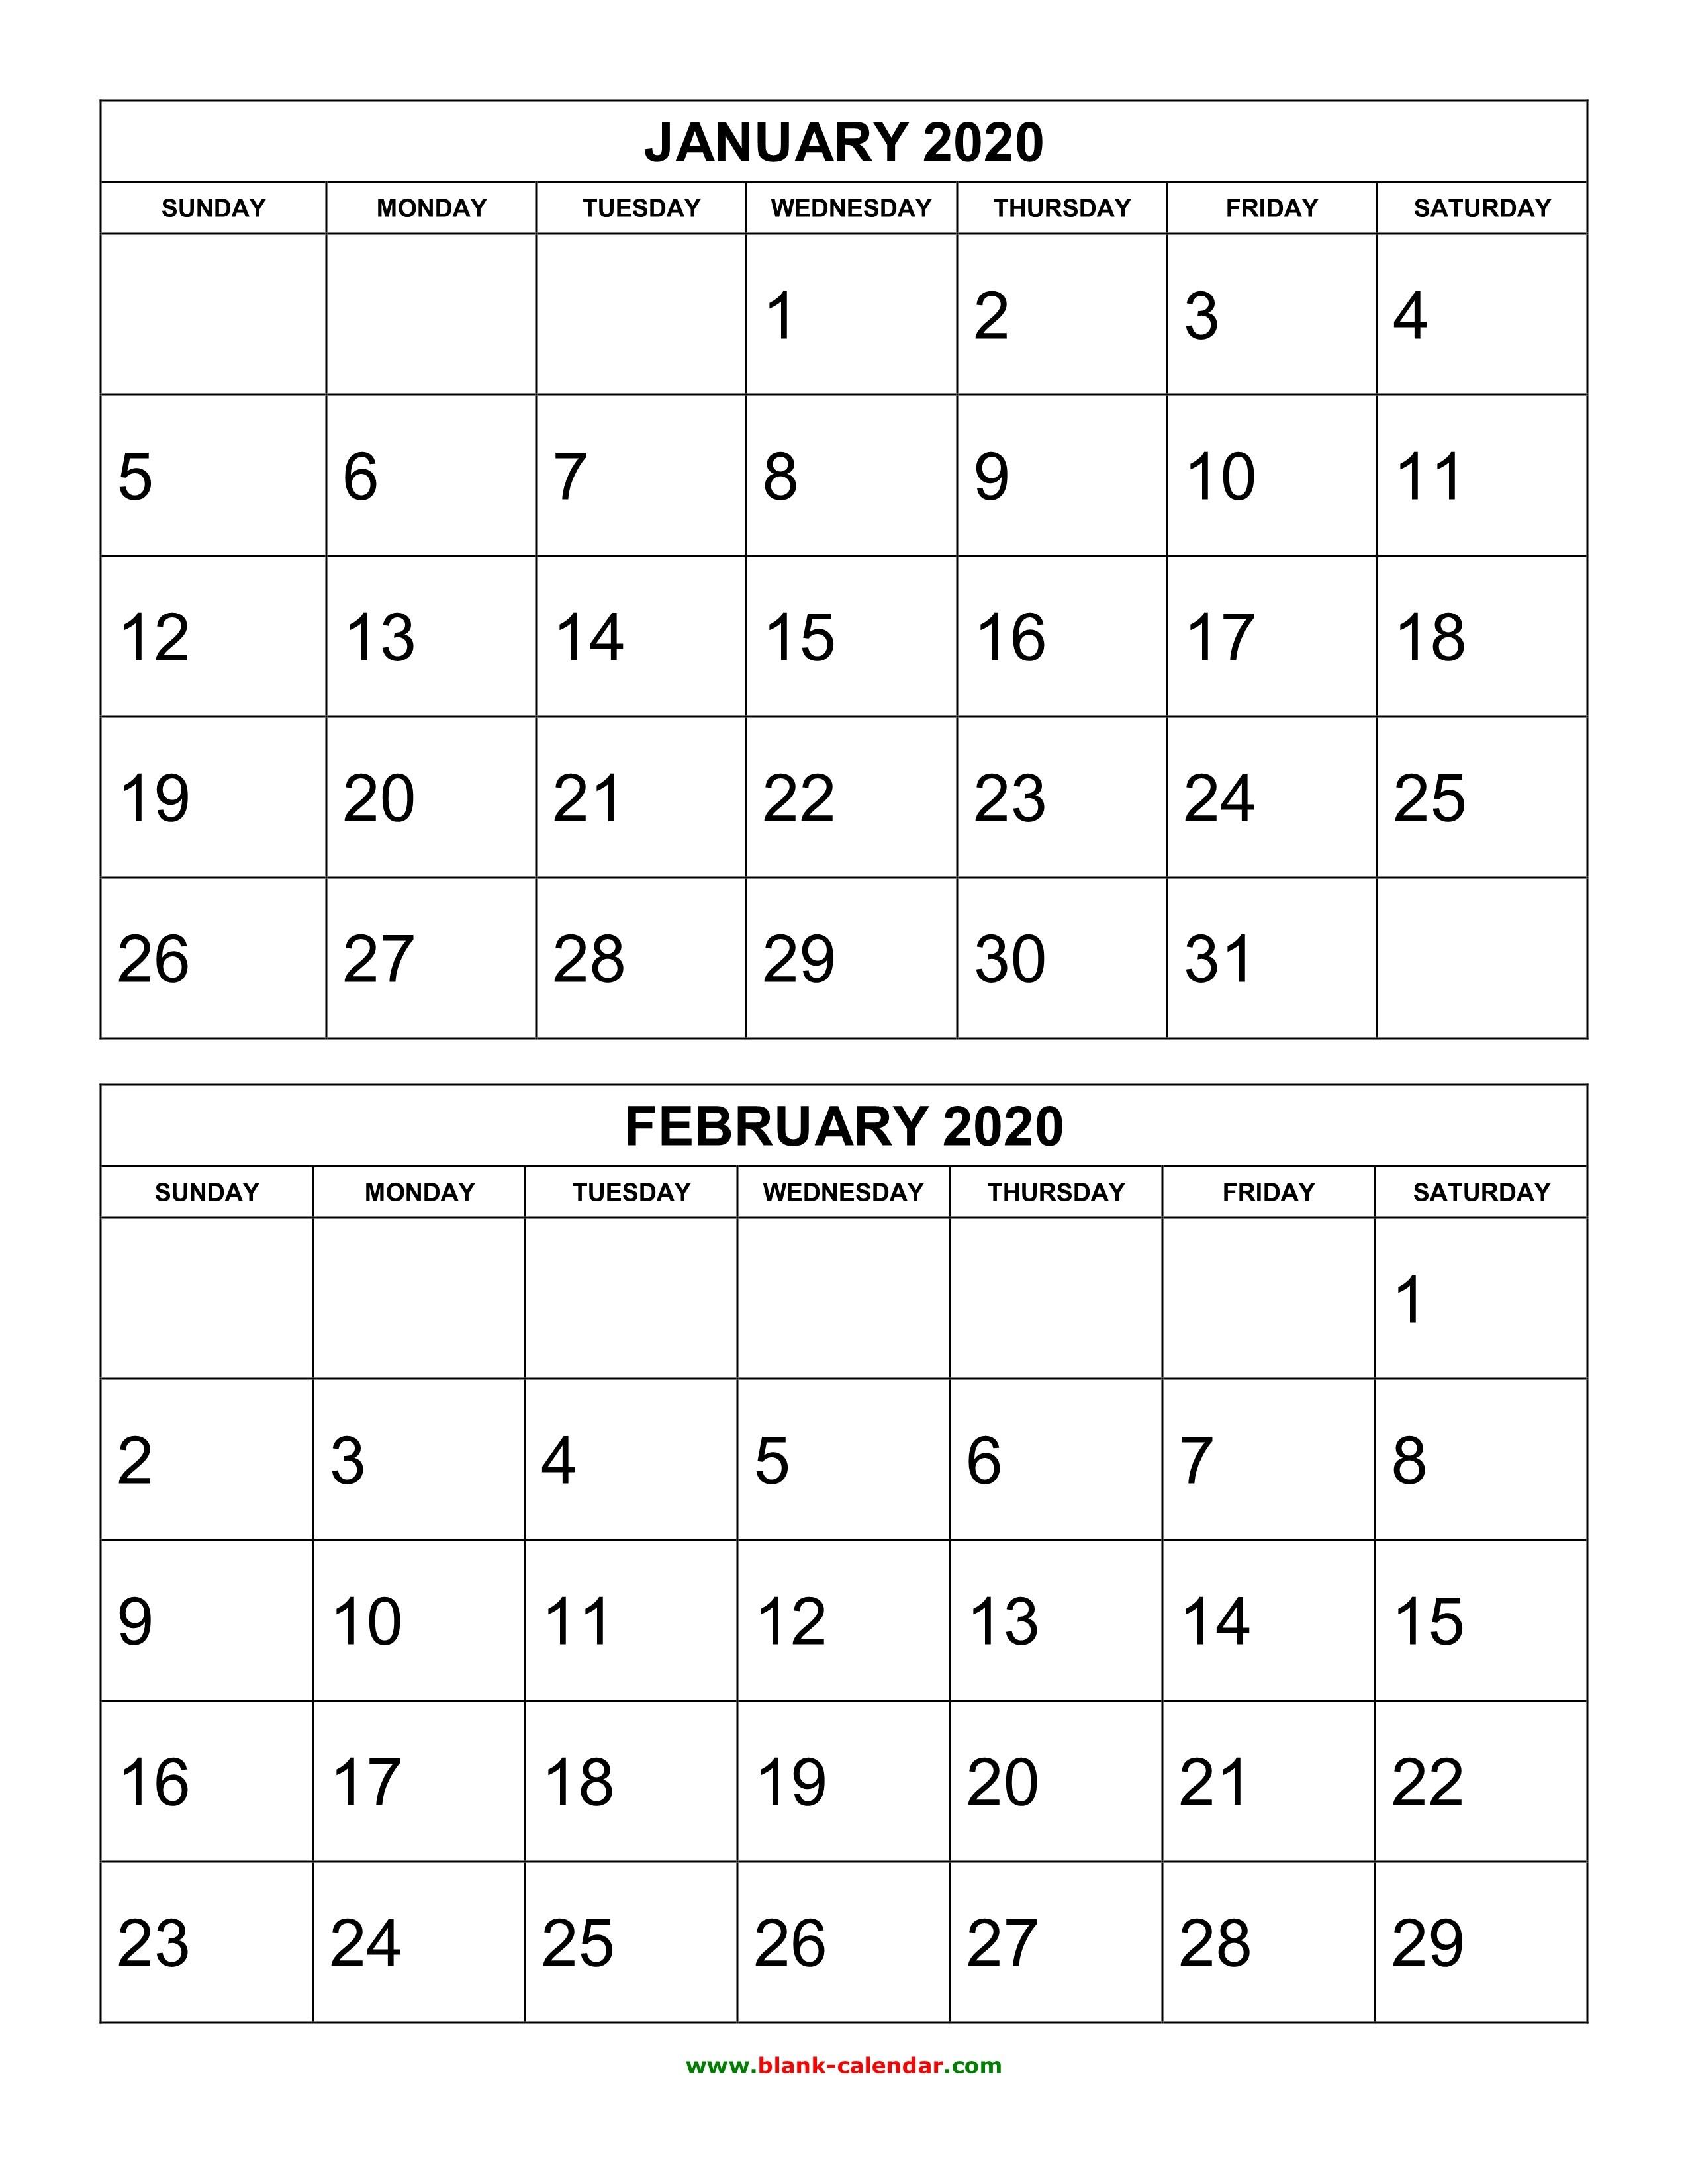 Free Download Printable Calendar 2020, 2 Months Per Page, 6-Calendar Template 4 Months Per Page